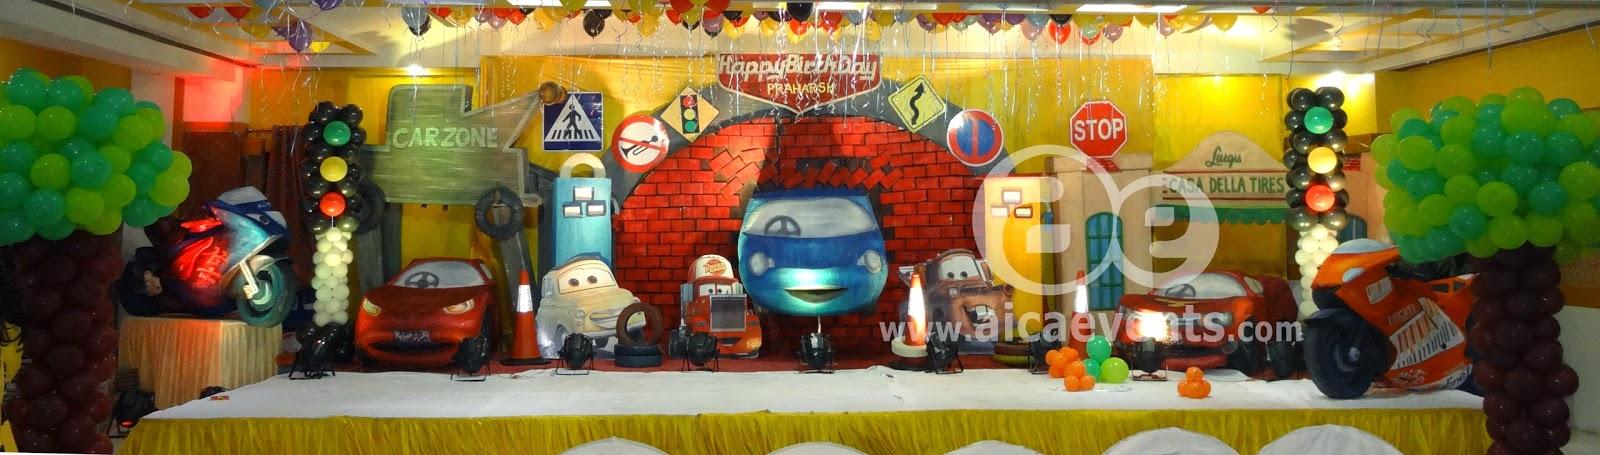 Aicaevents India Disney Cars Theme Birthday Party